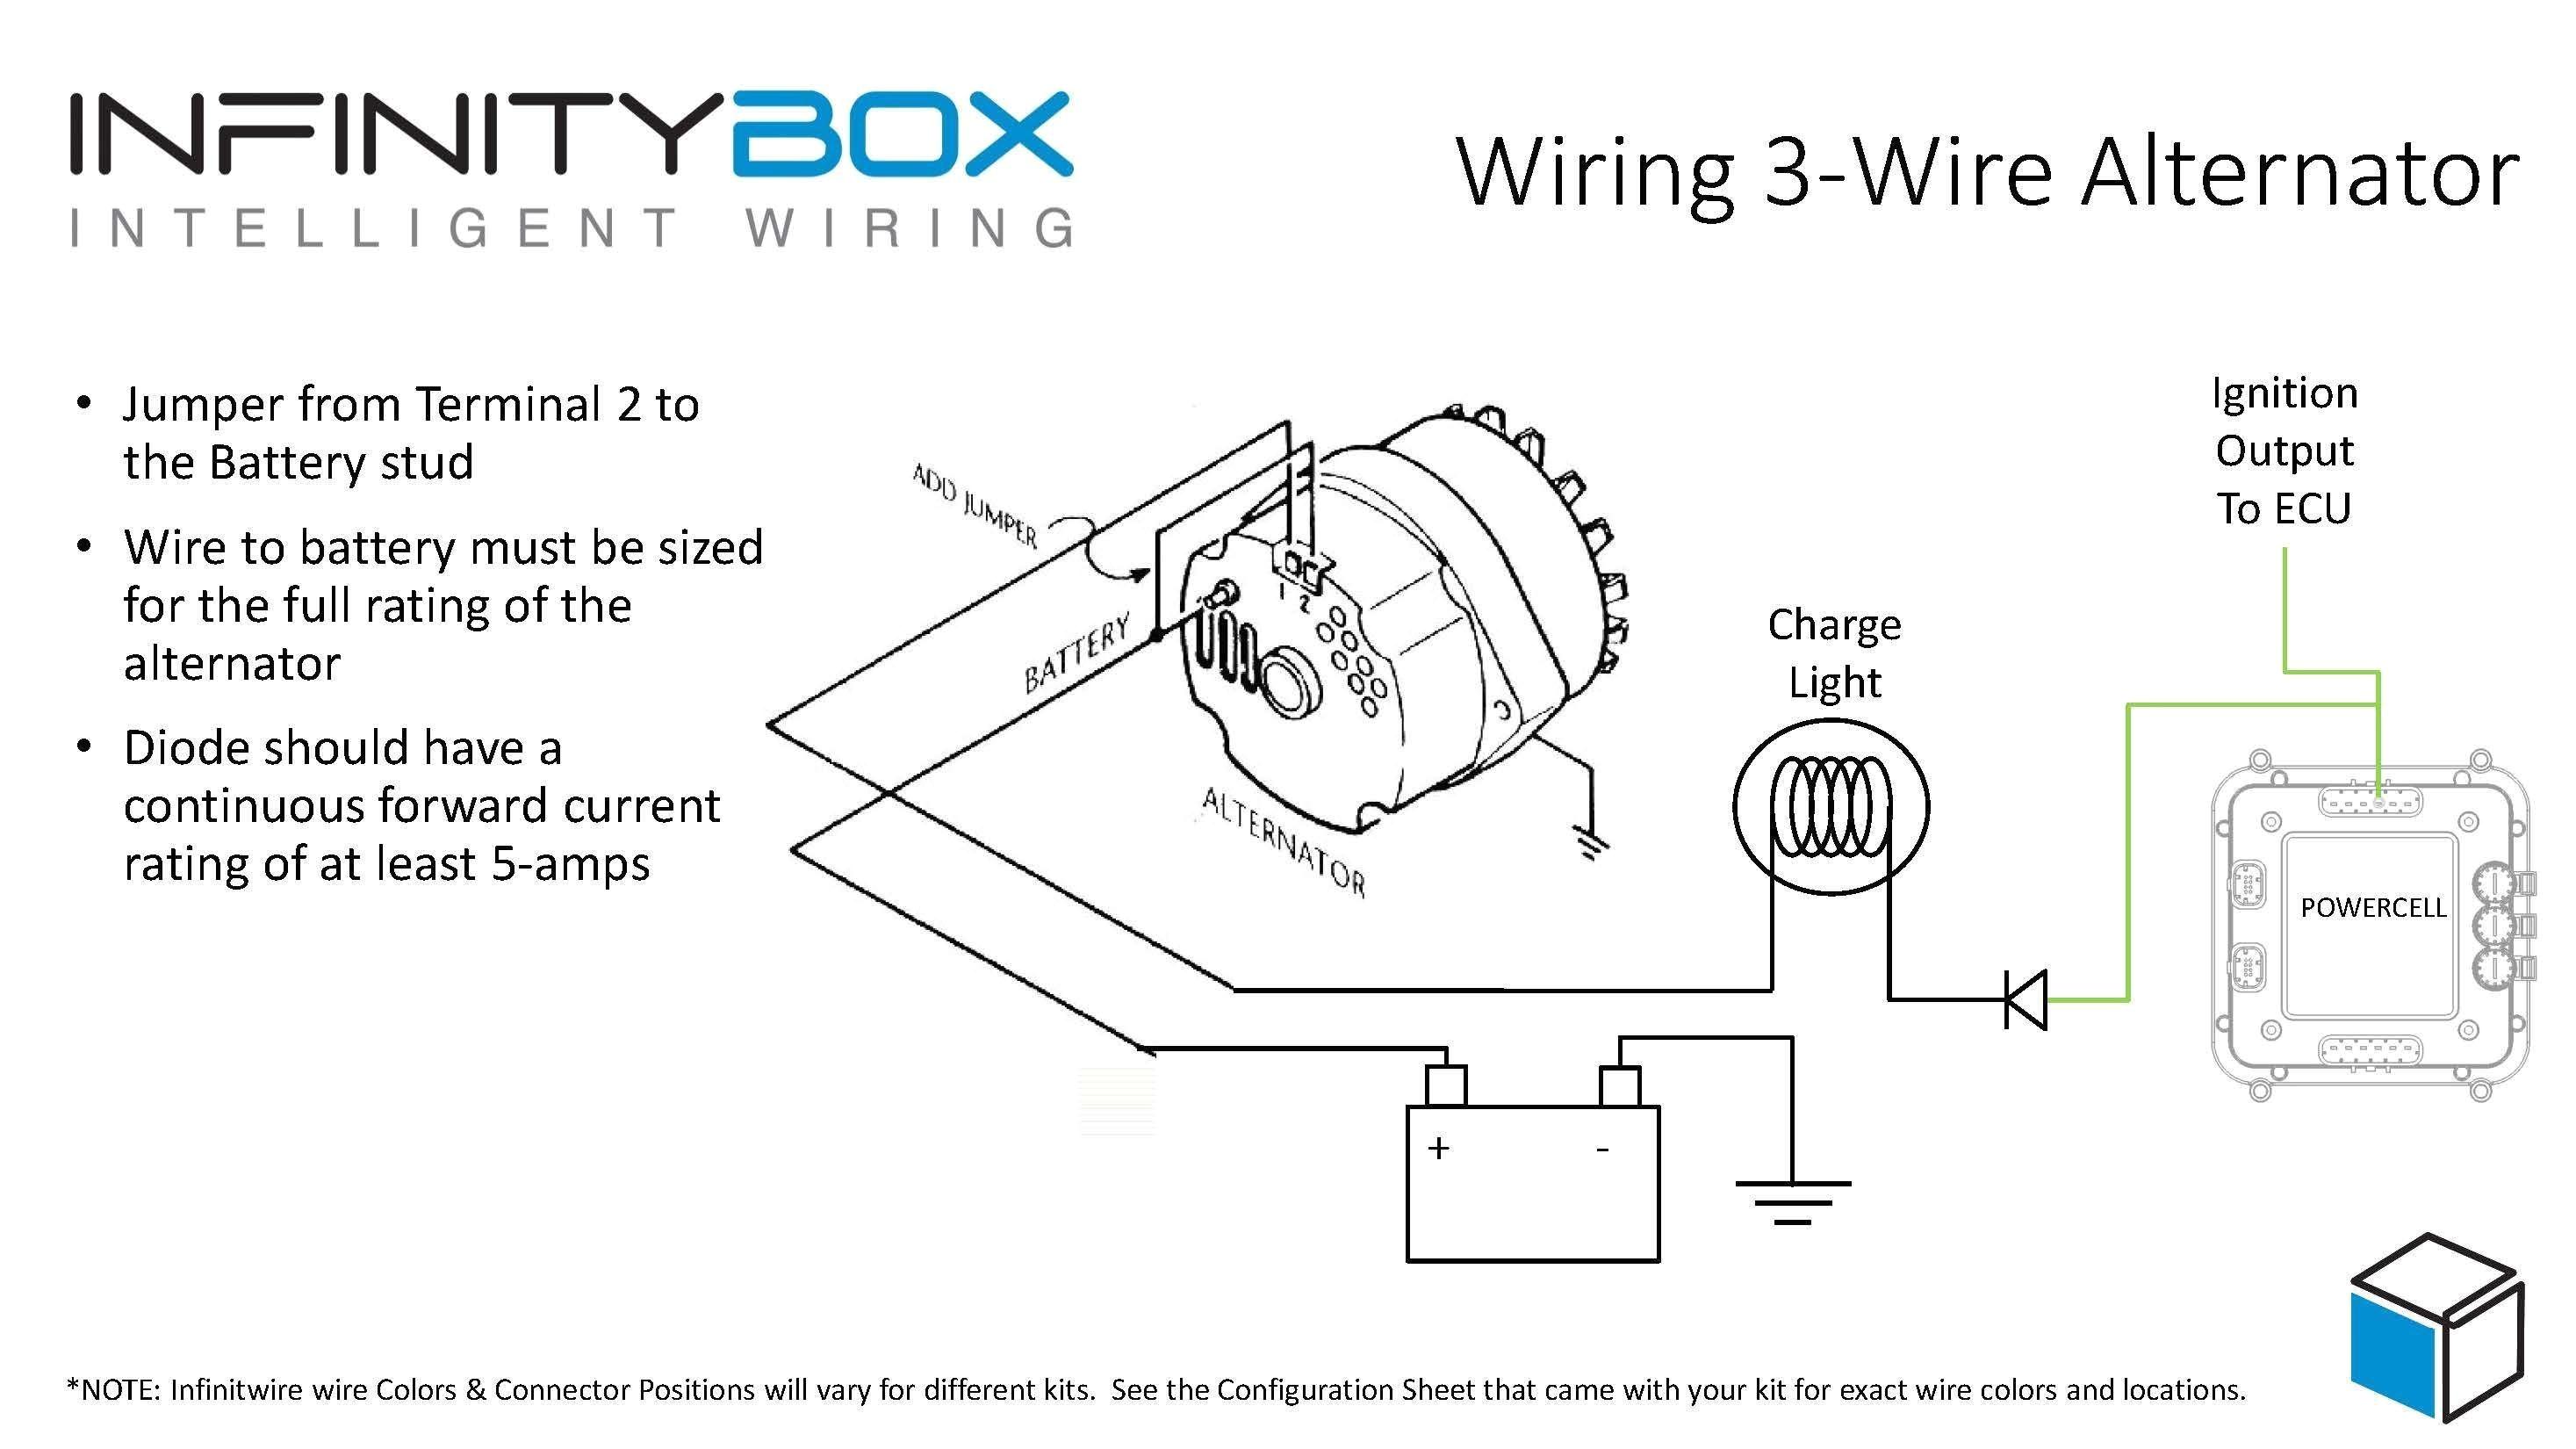 Wiring Diagram for An Alternator Nissan 1400 Alternator Wiring Diagram Wiring Diagrams Schema